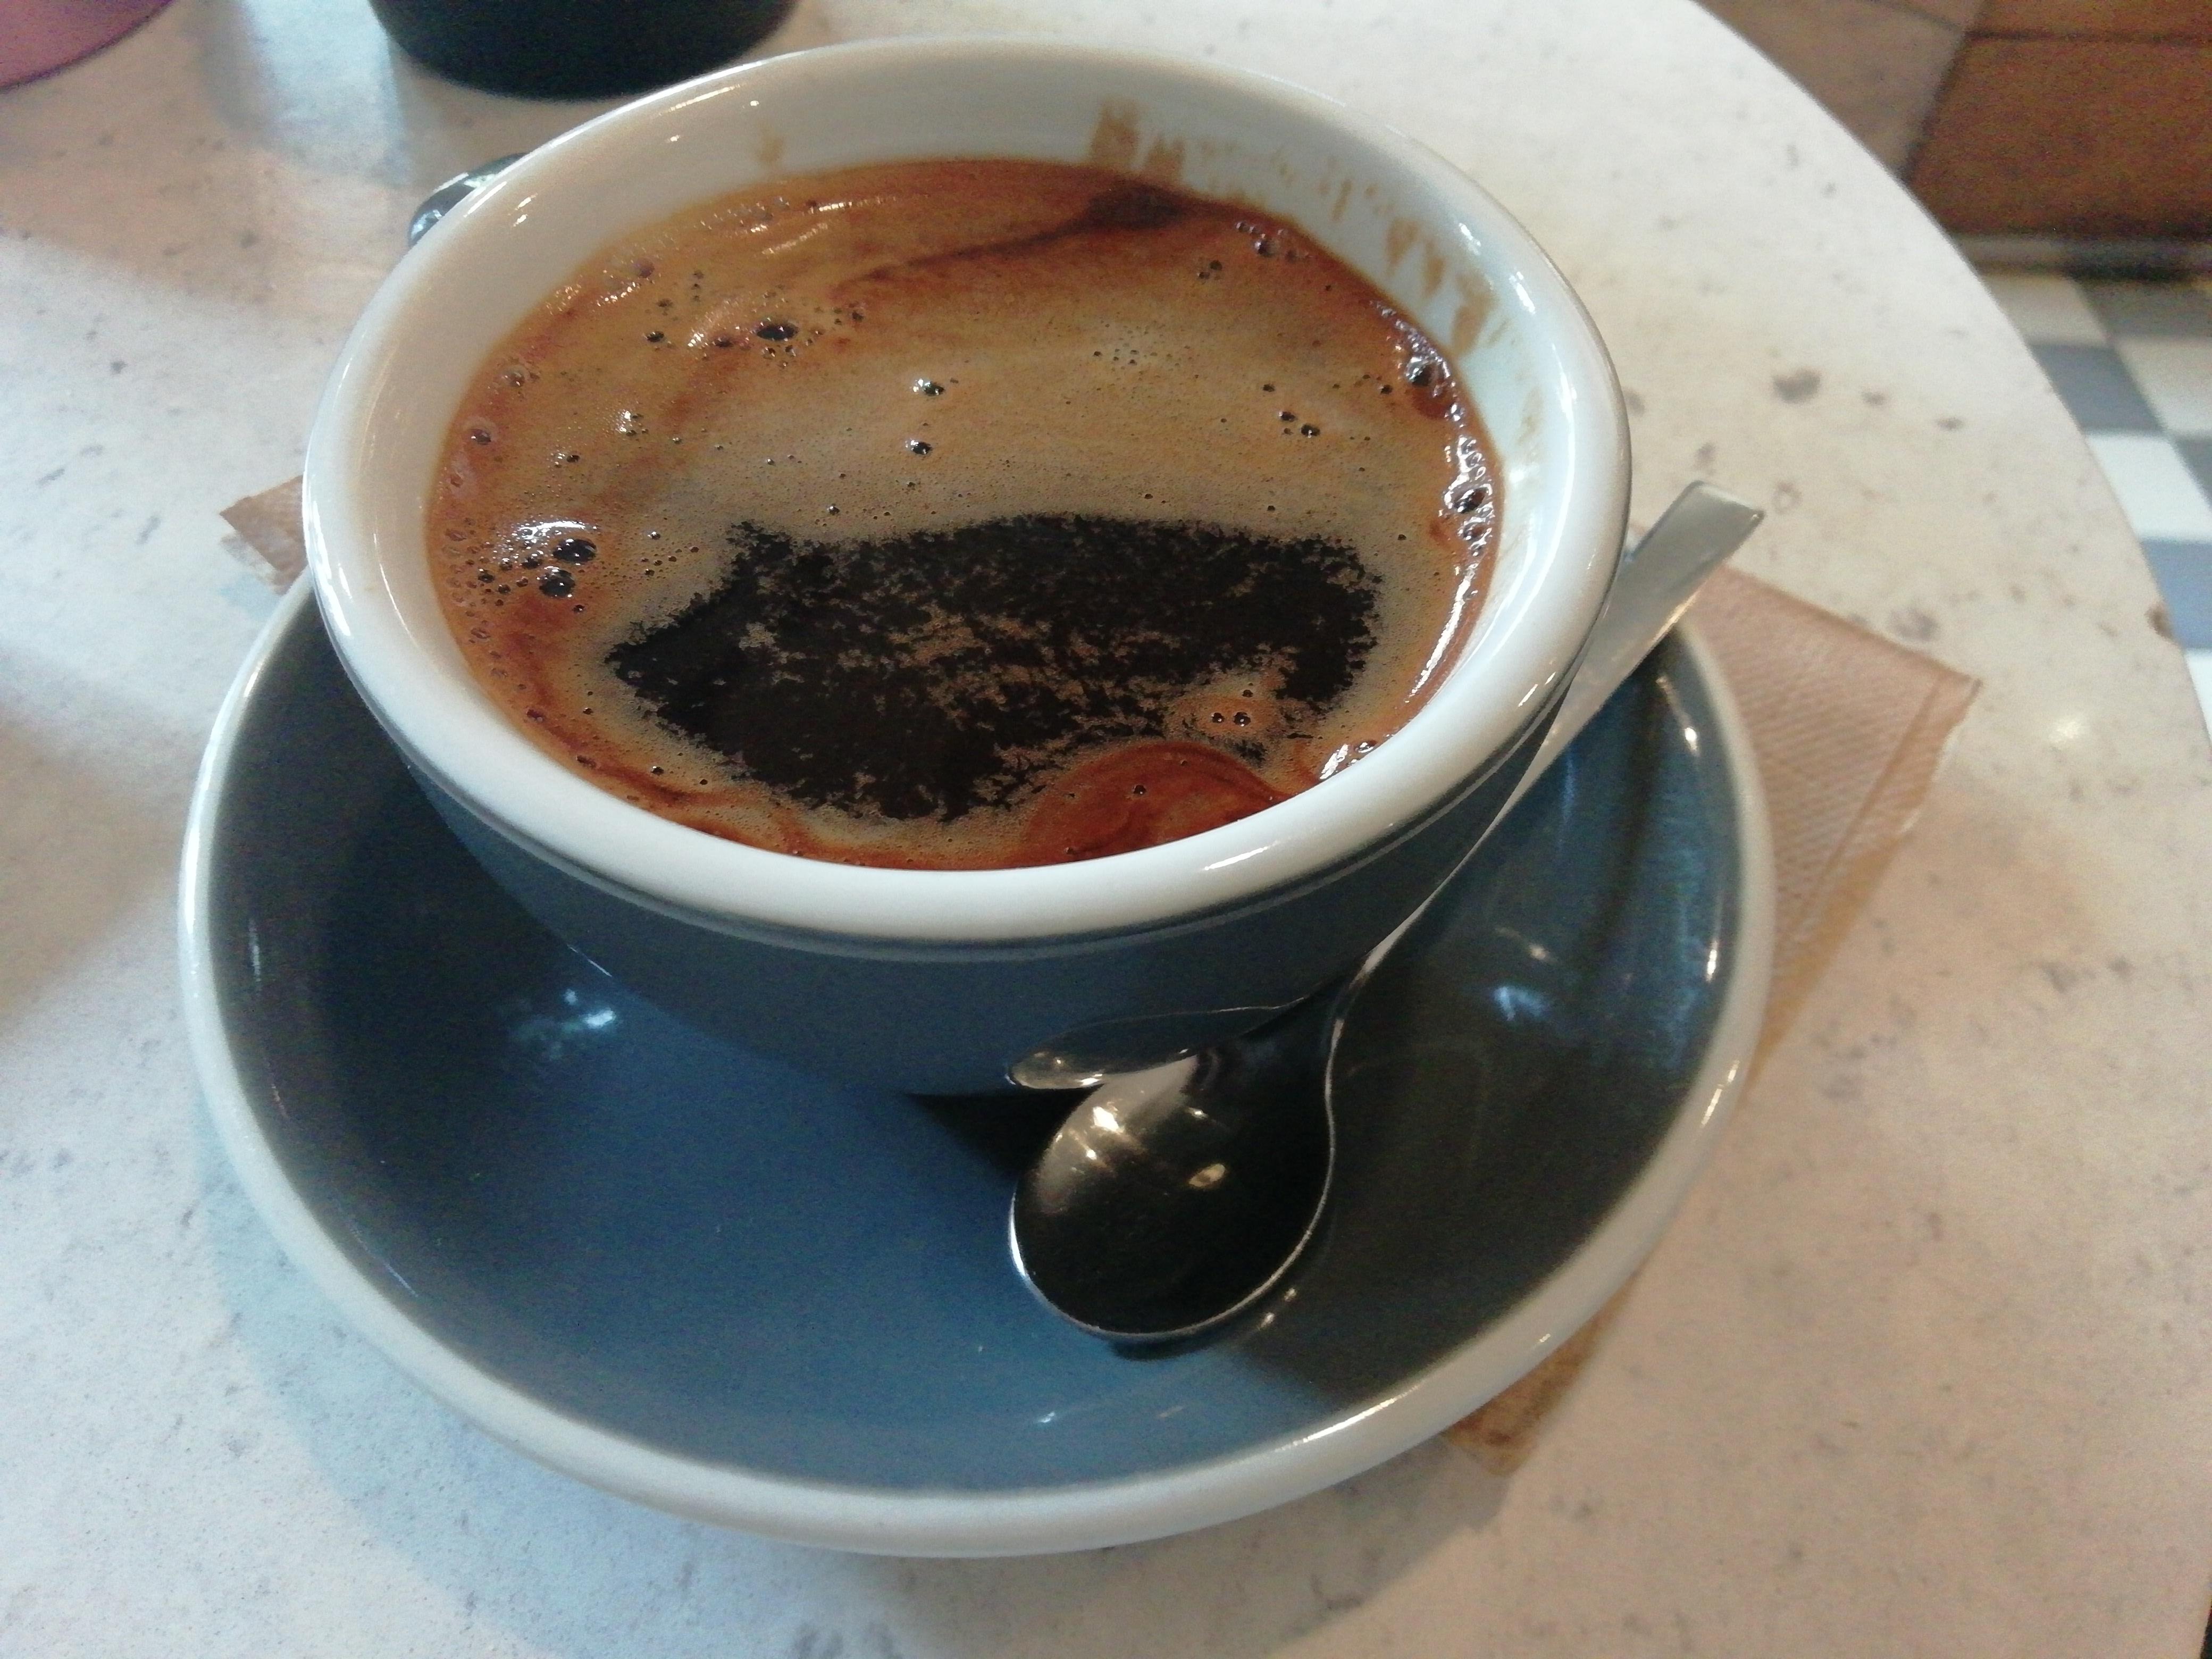 File:Café americano CDMX.jpg - Wikimedia Commons